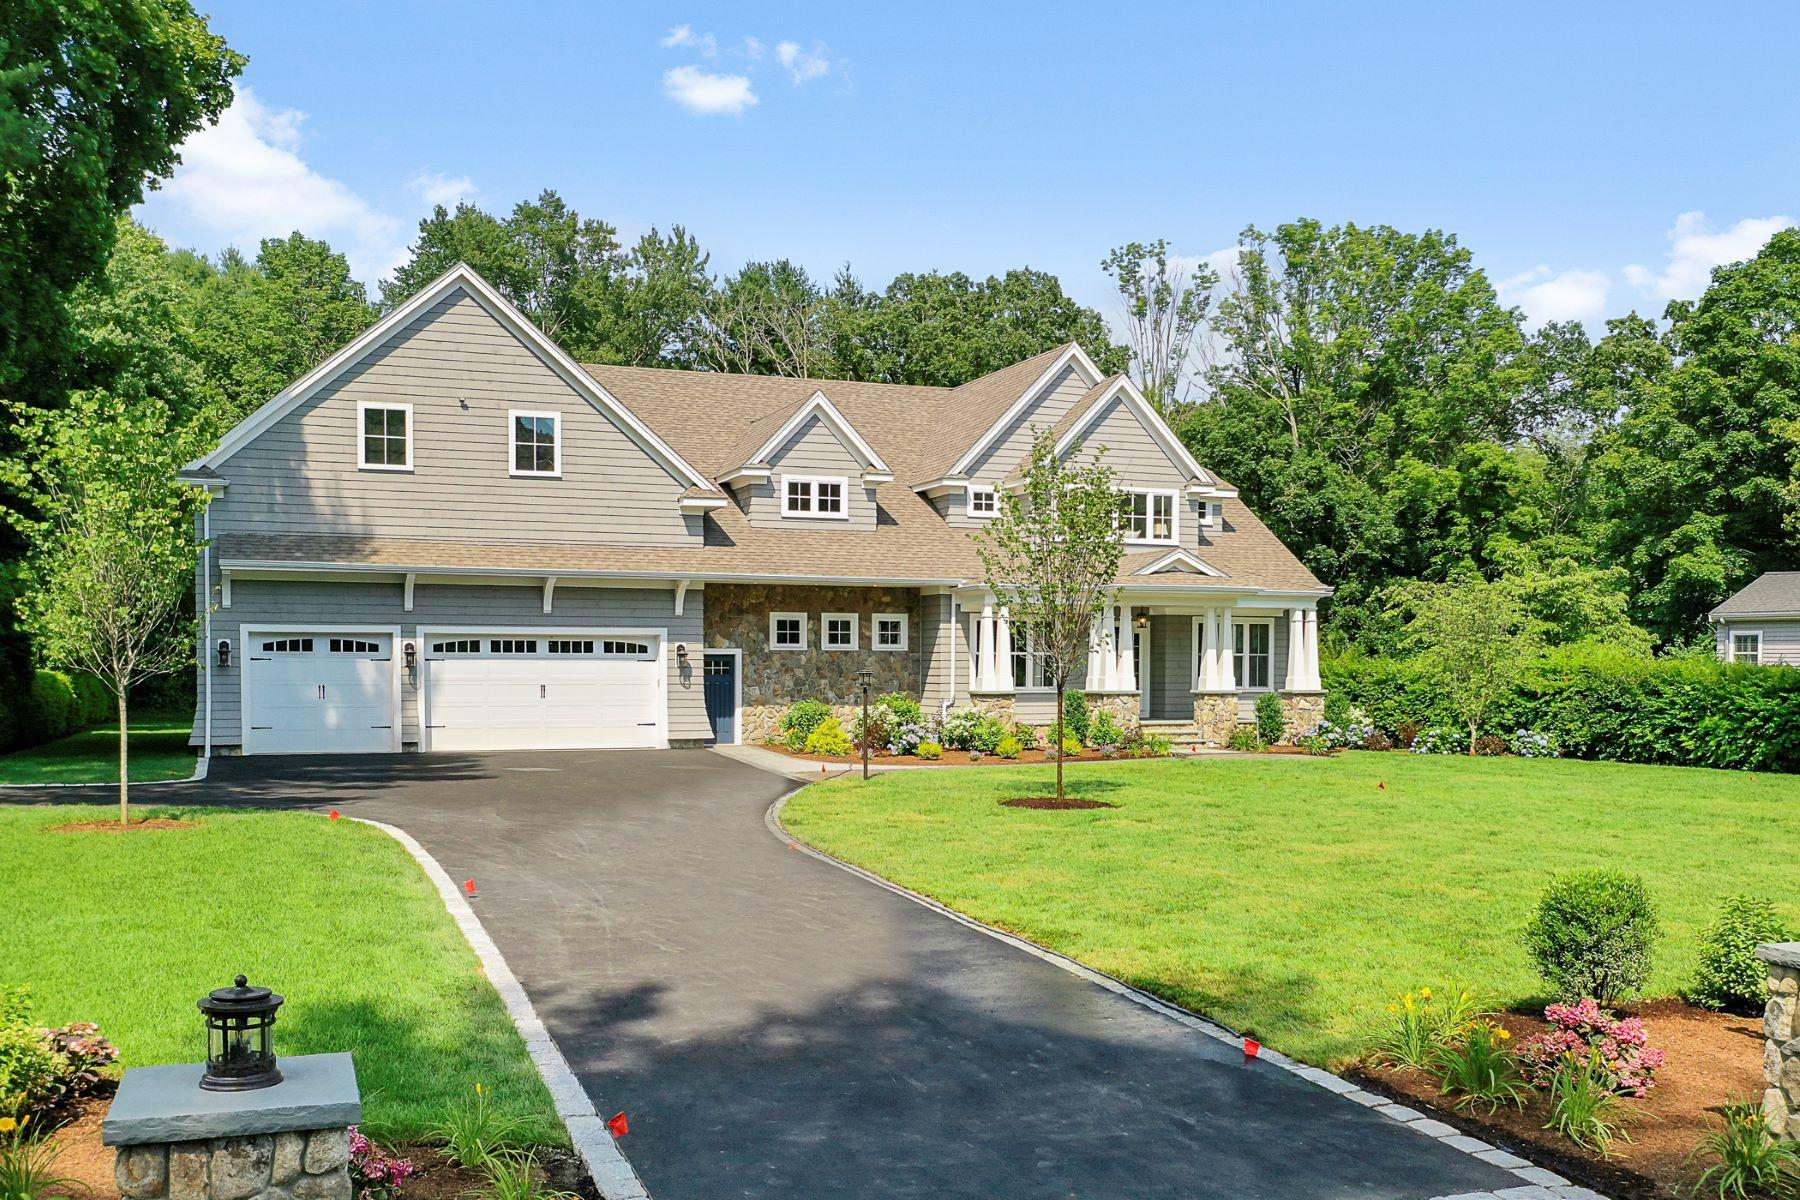 Single Family Homes for Active at 2 Jonathan Lane, Bedford 2 Jonathan Ln Bedford, Massachusetts 01730 United States